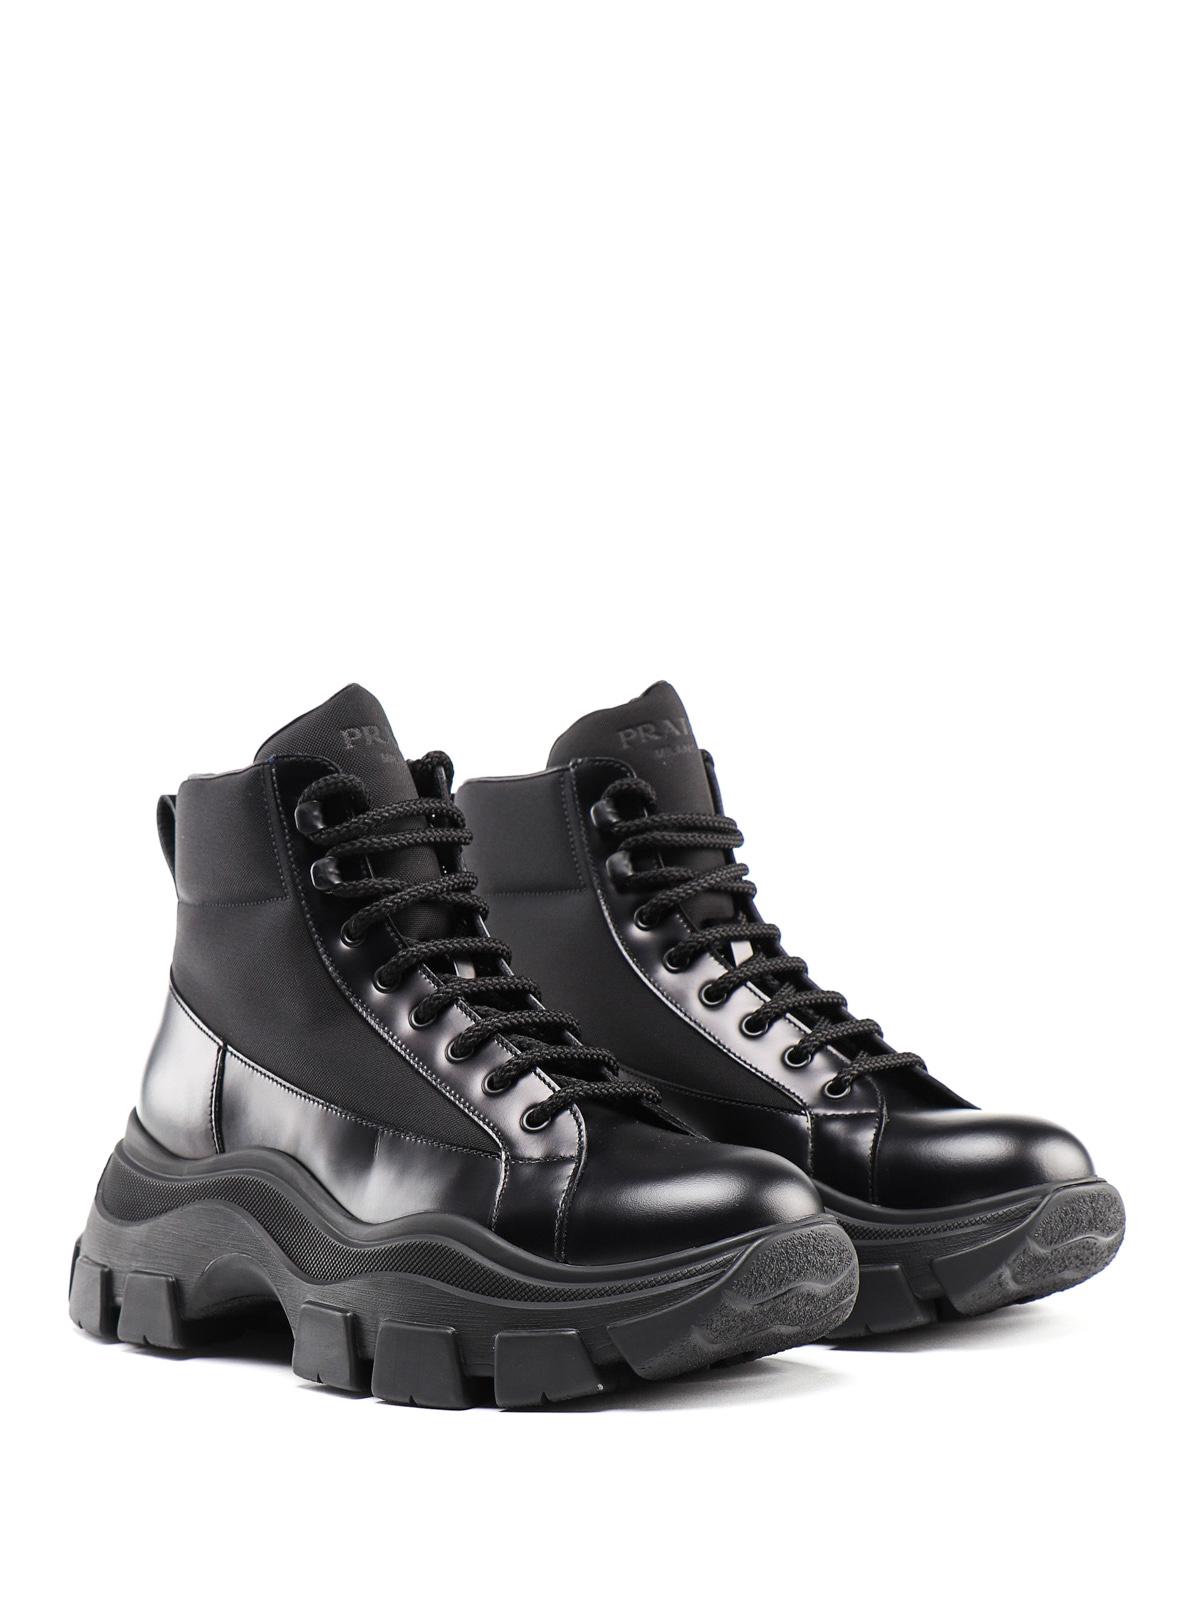 Prada - Pegasus chunky ankle boots